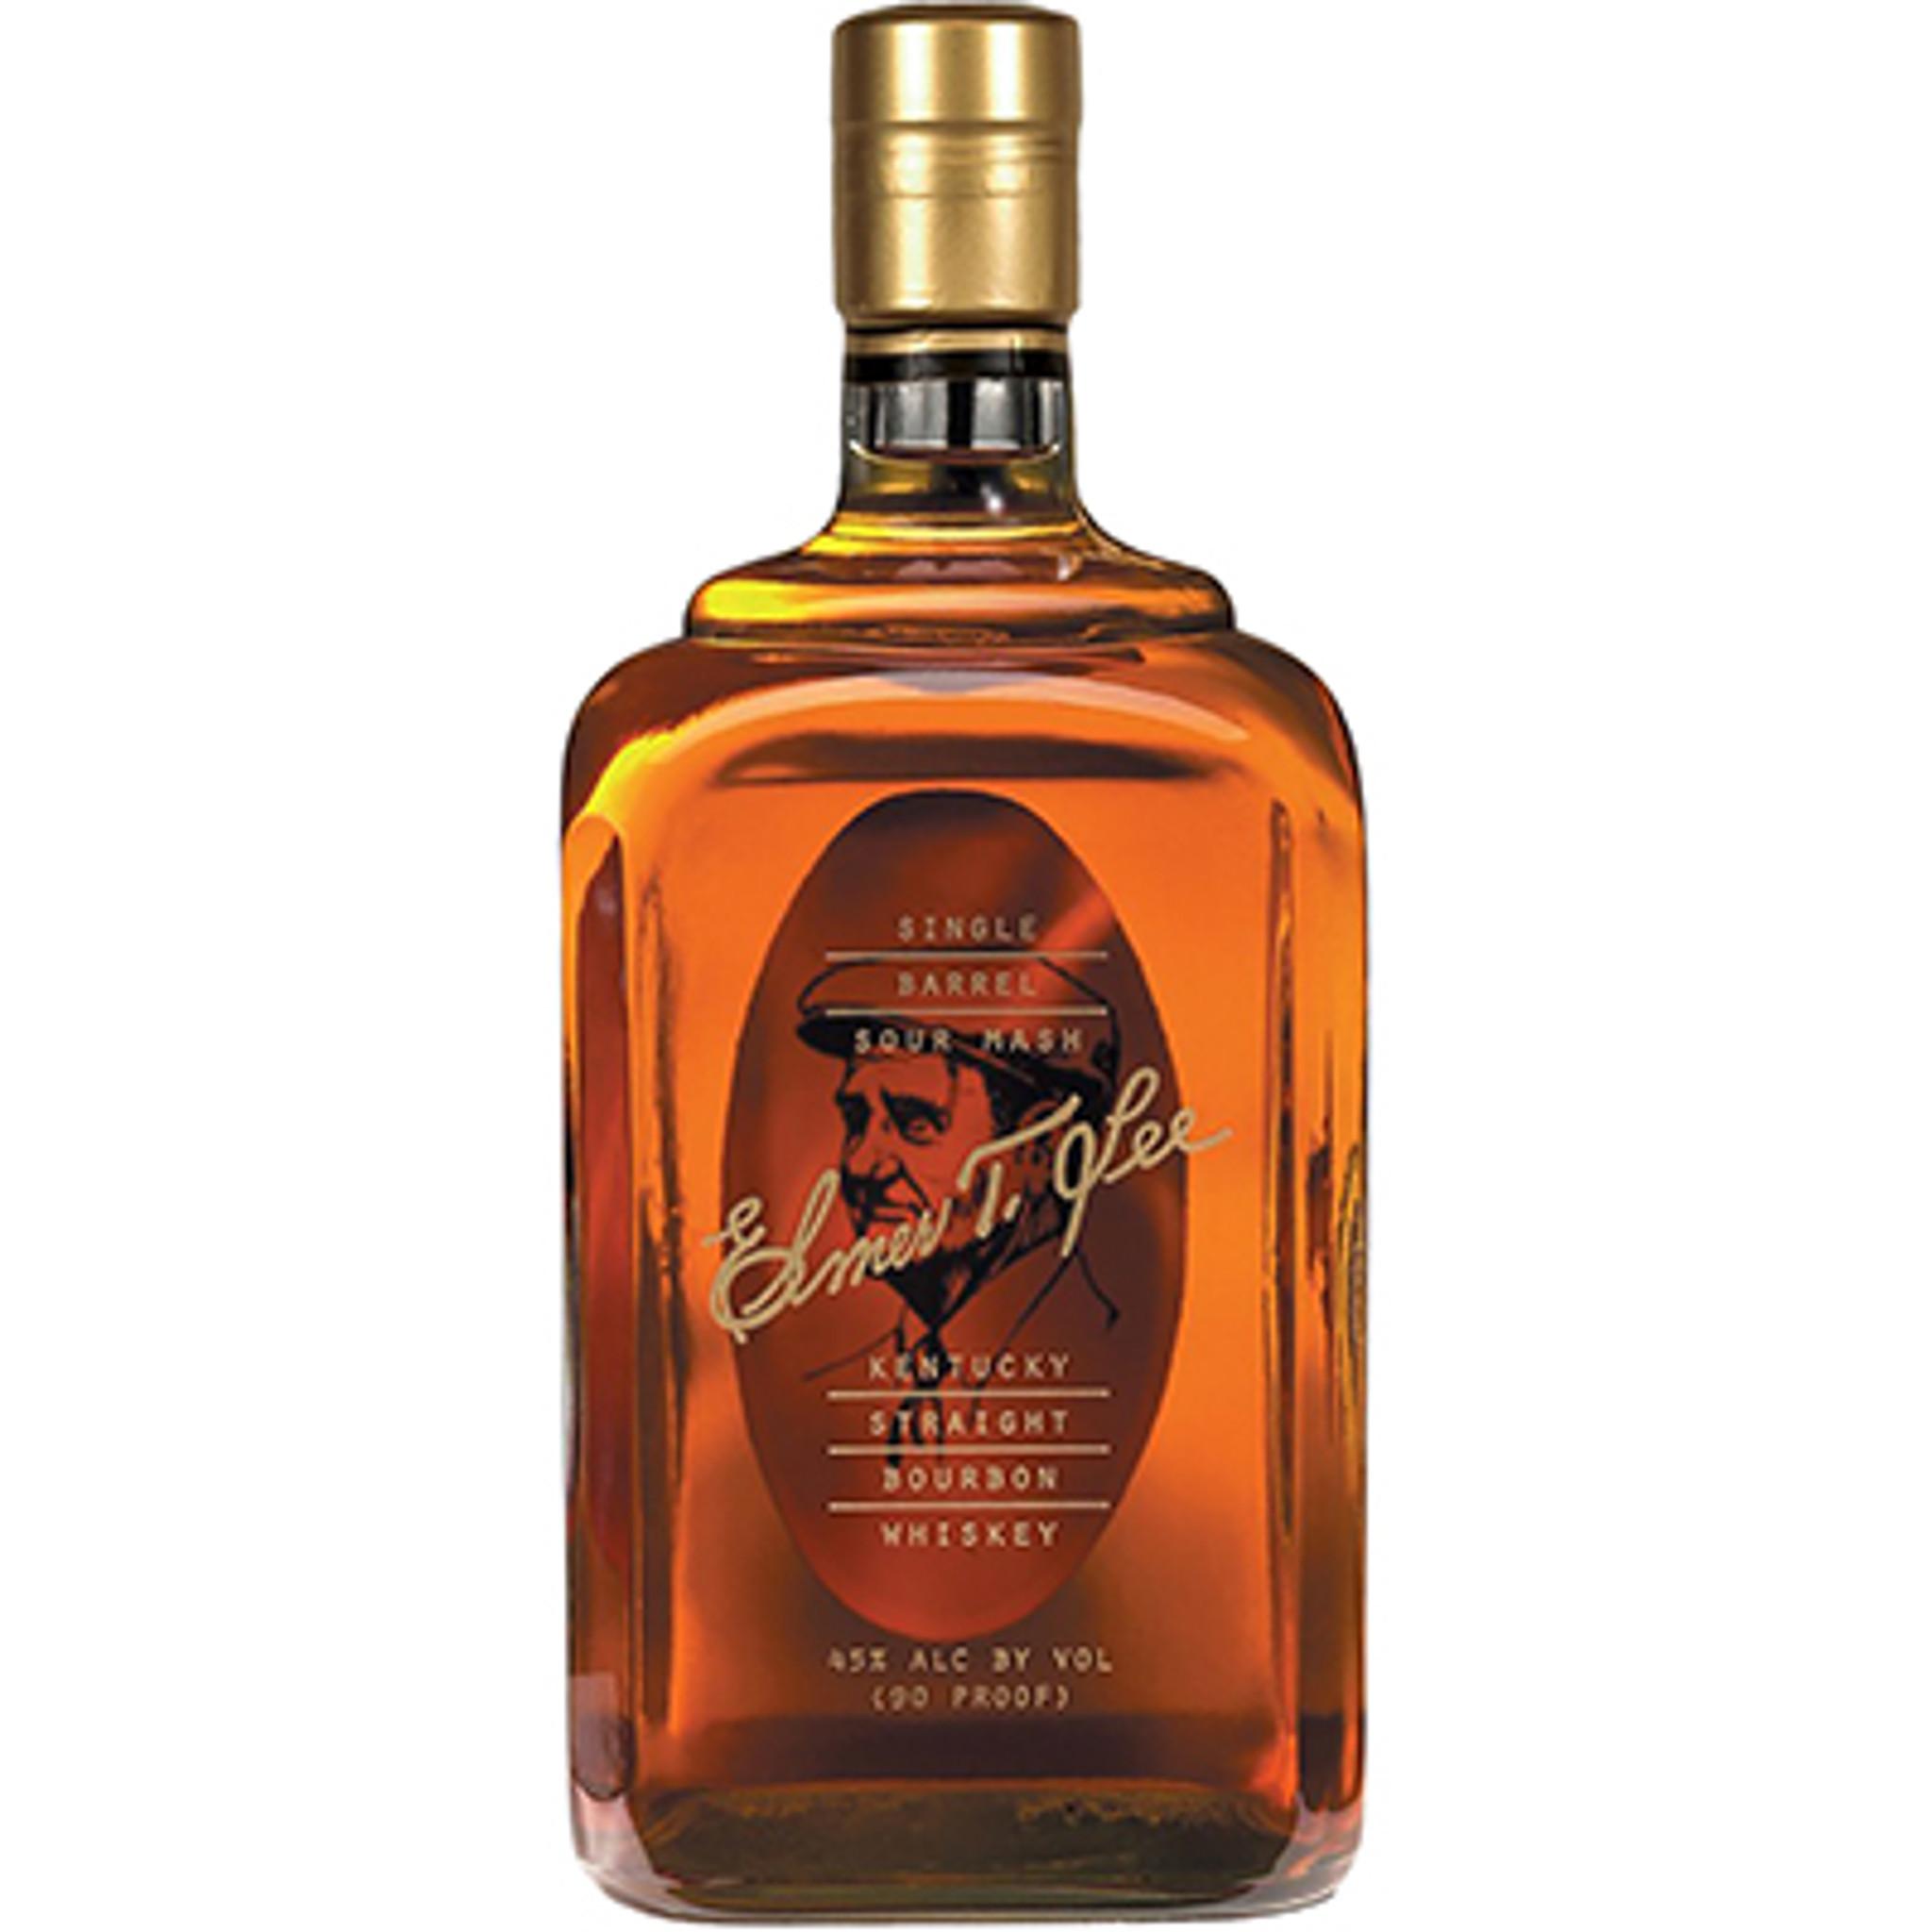 Elmer T Lee Single Barrel Bourbon Whiskey - The House of Glunz